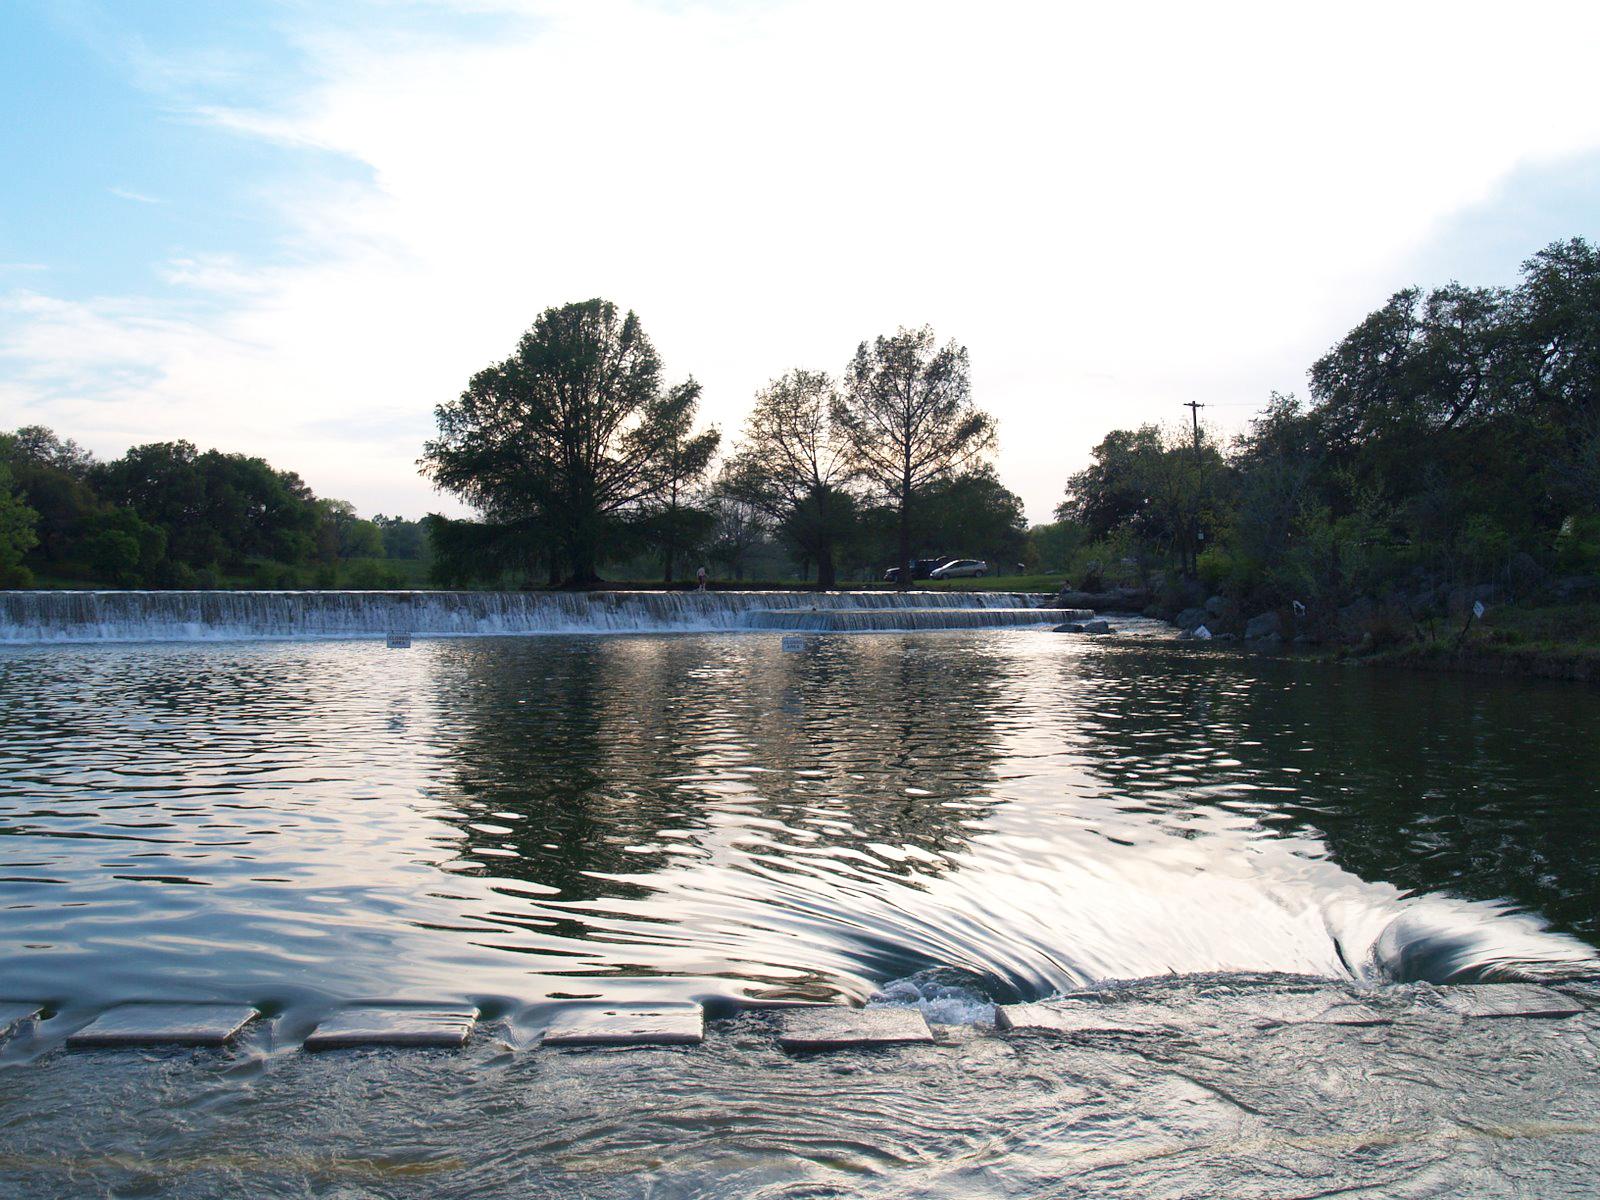 blanco state park river crossing bridge low water flood